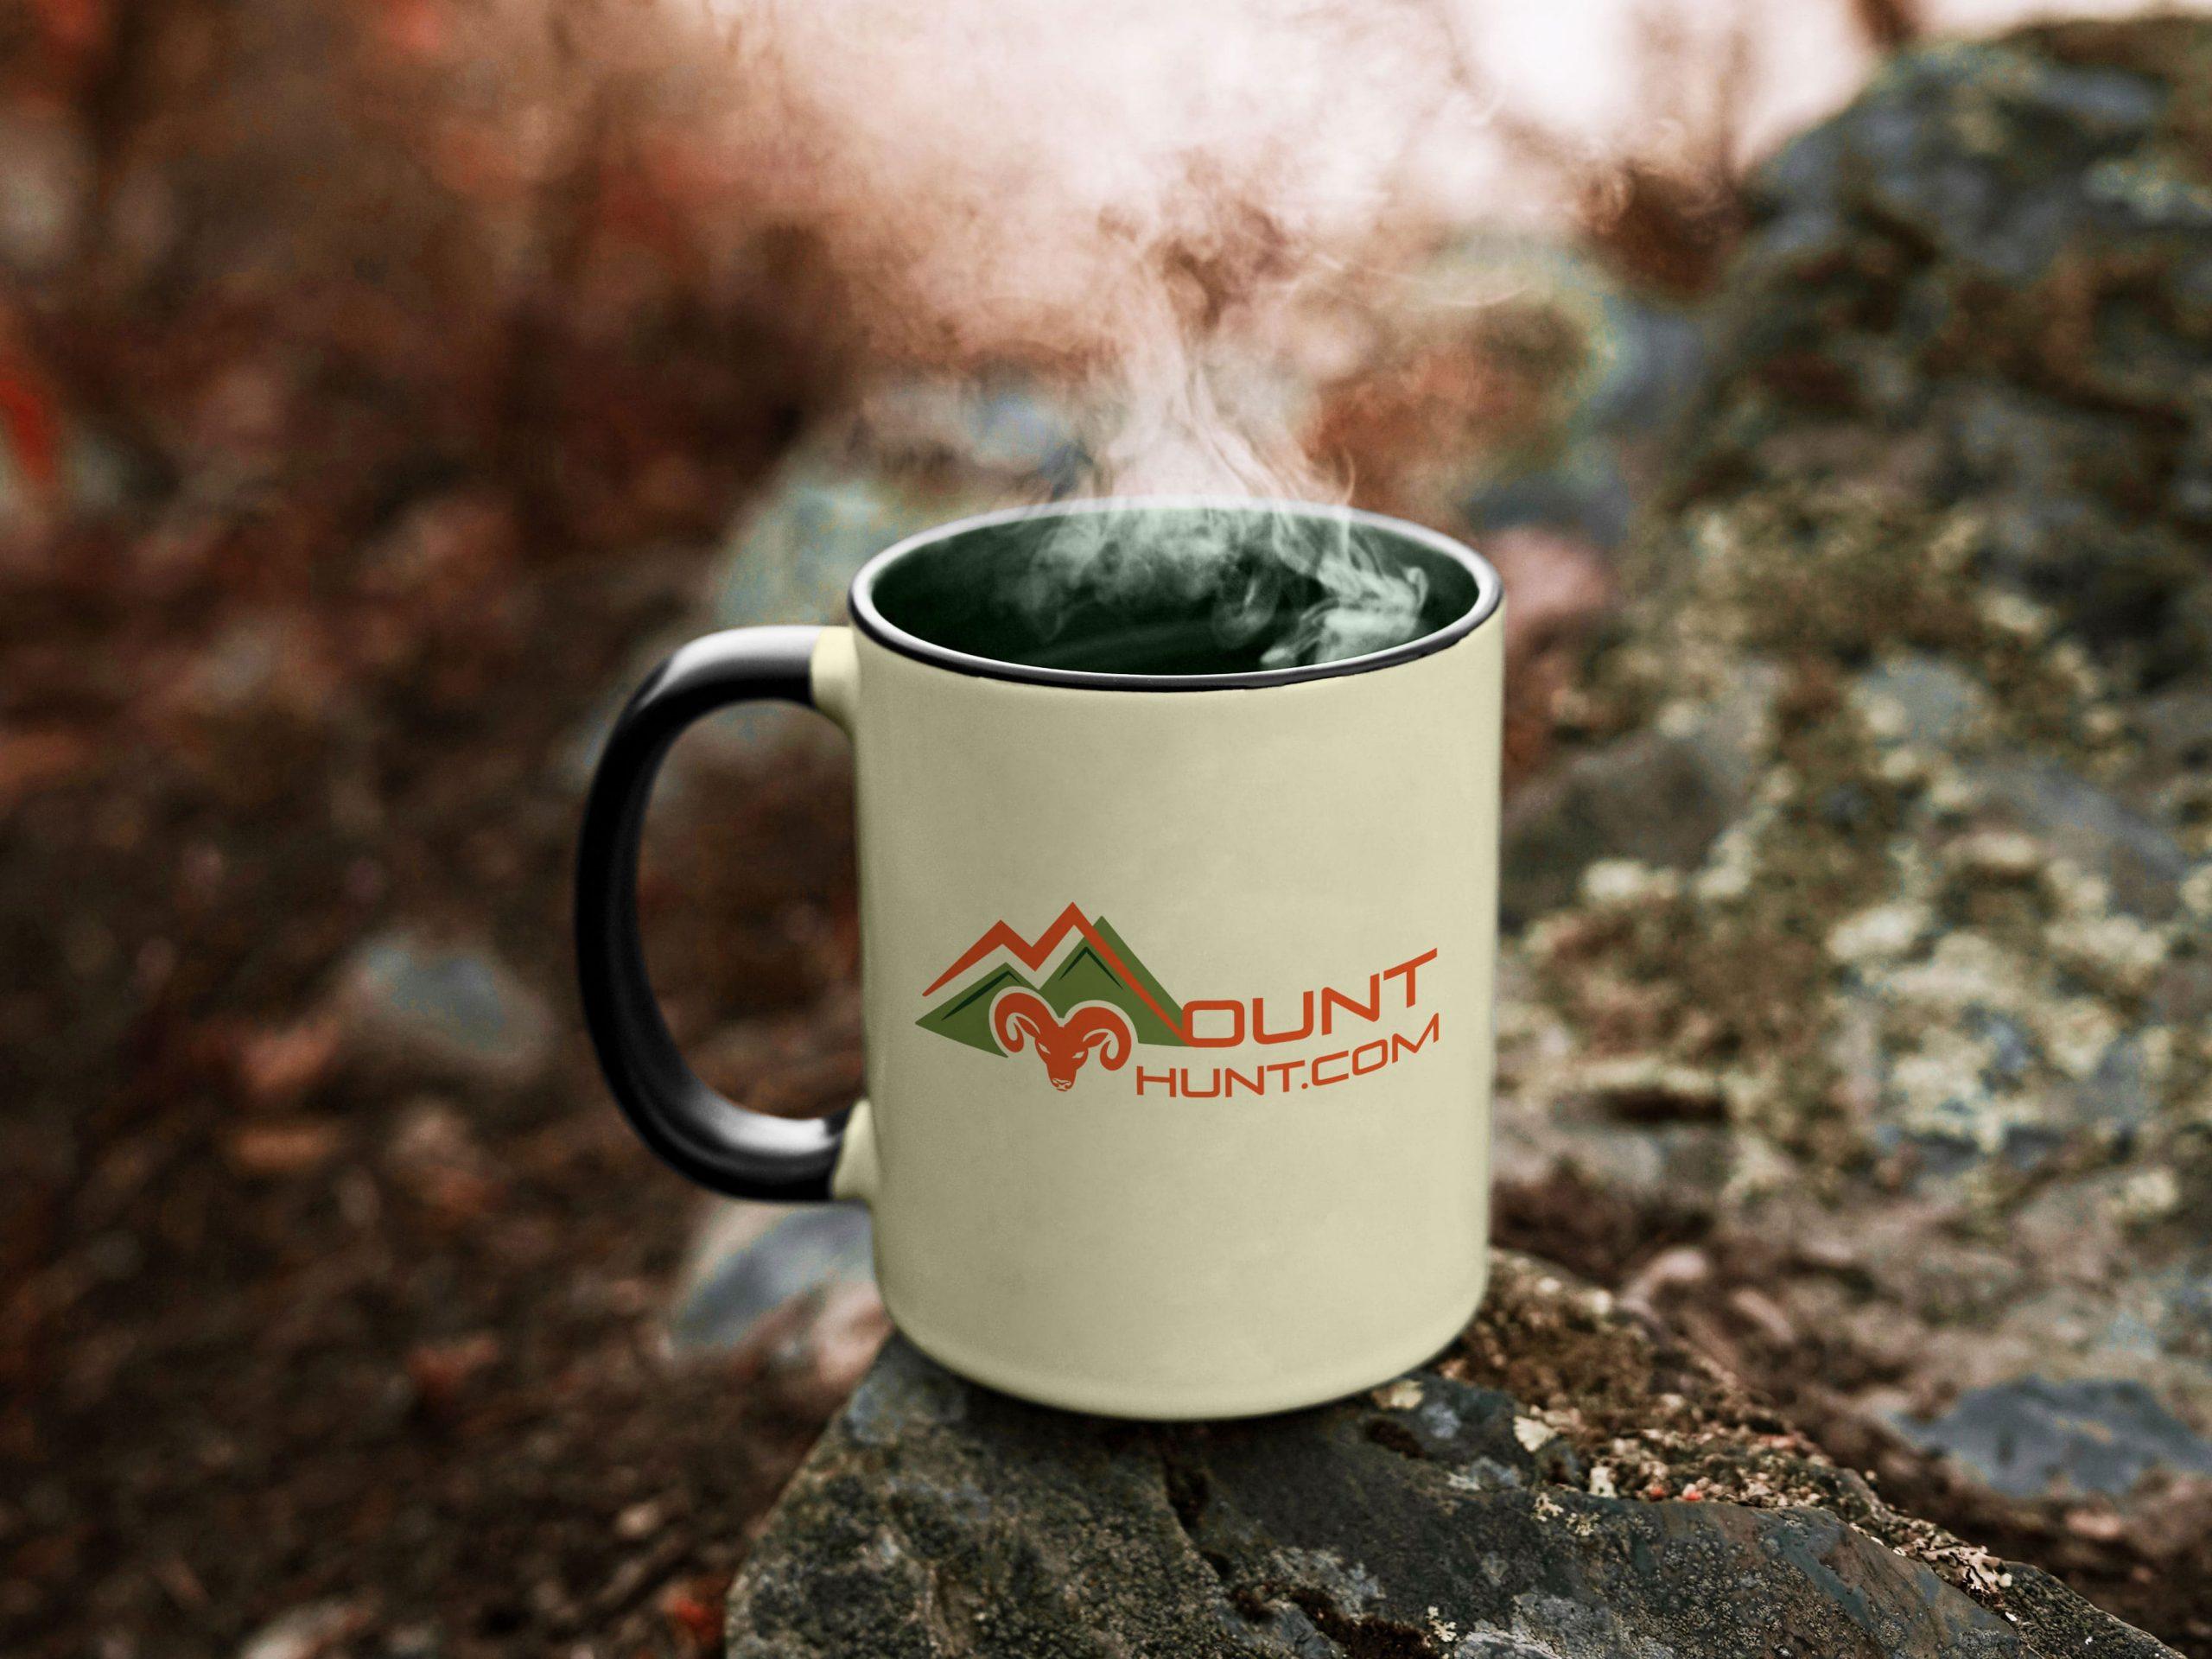 Mug-MountHunt logo cup